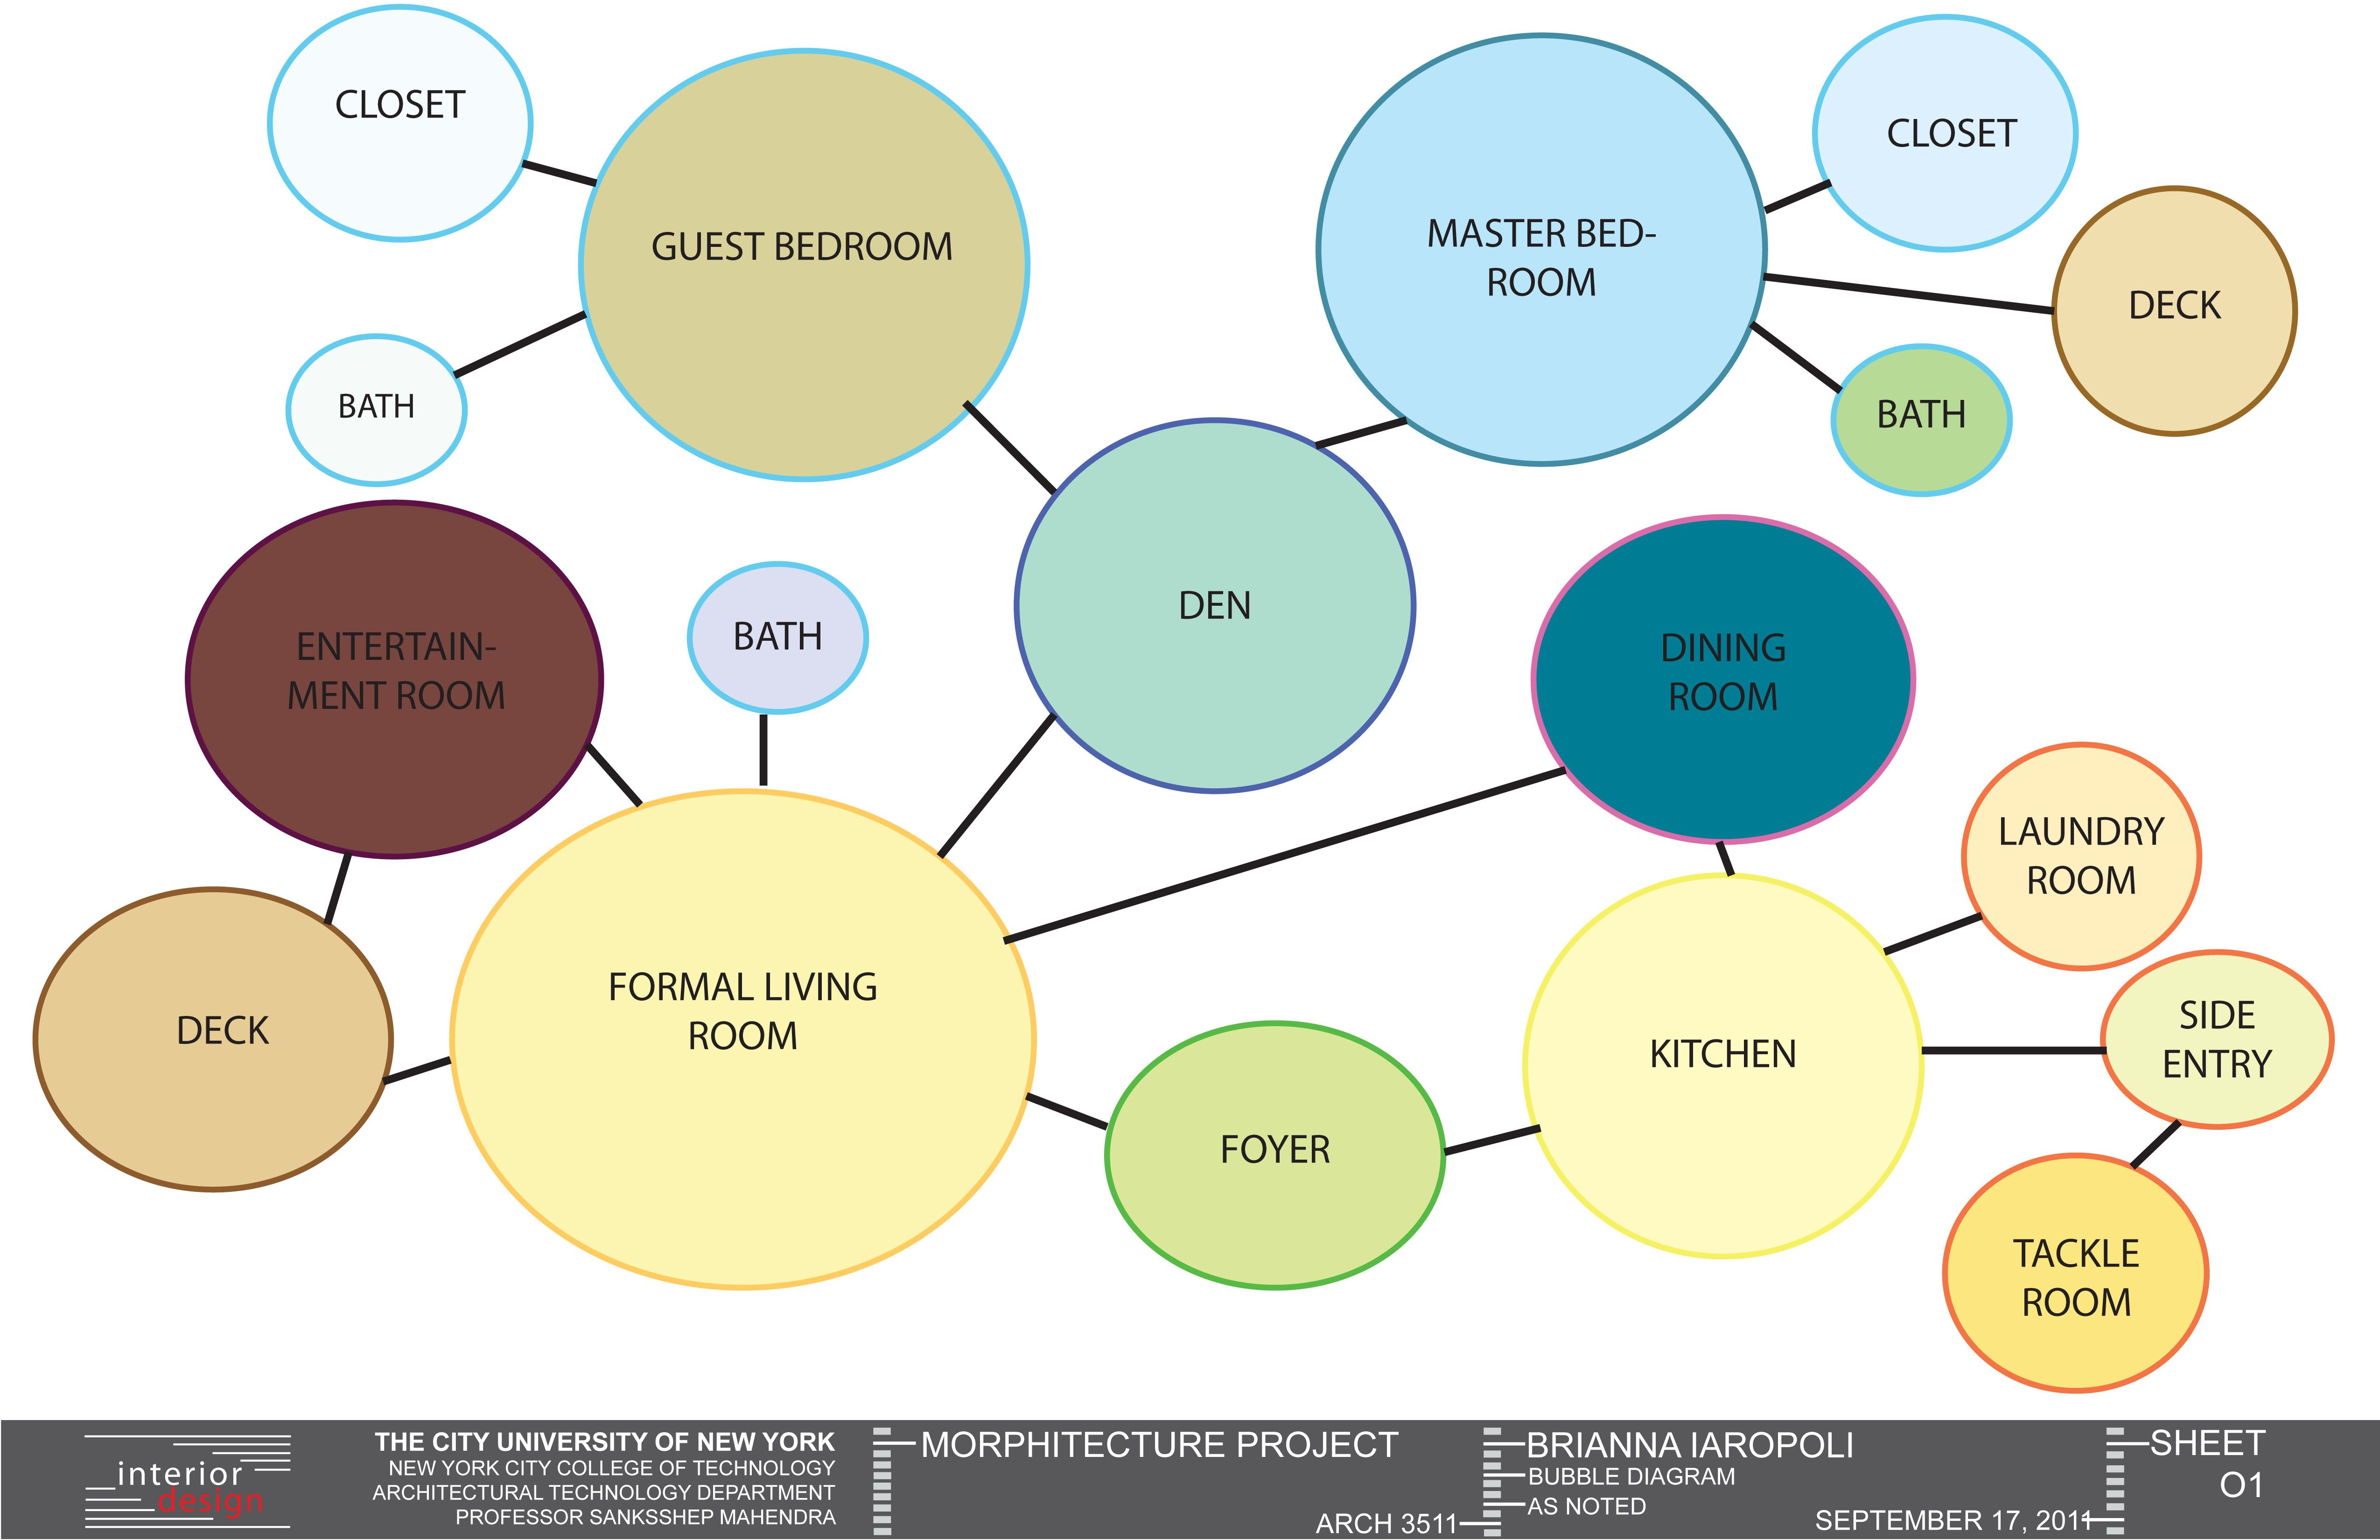 Bubble Diagram Template For Excel Valve Timing 4 Stroke Diesel Engine Interior Design Resources Pinterest